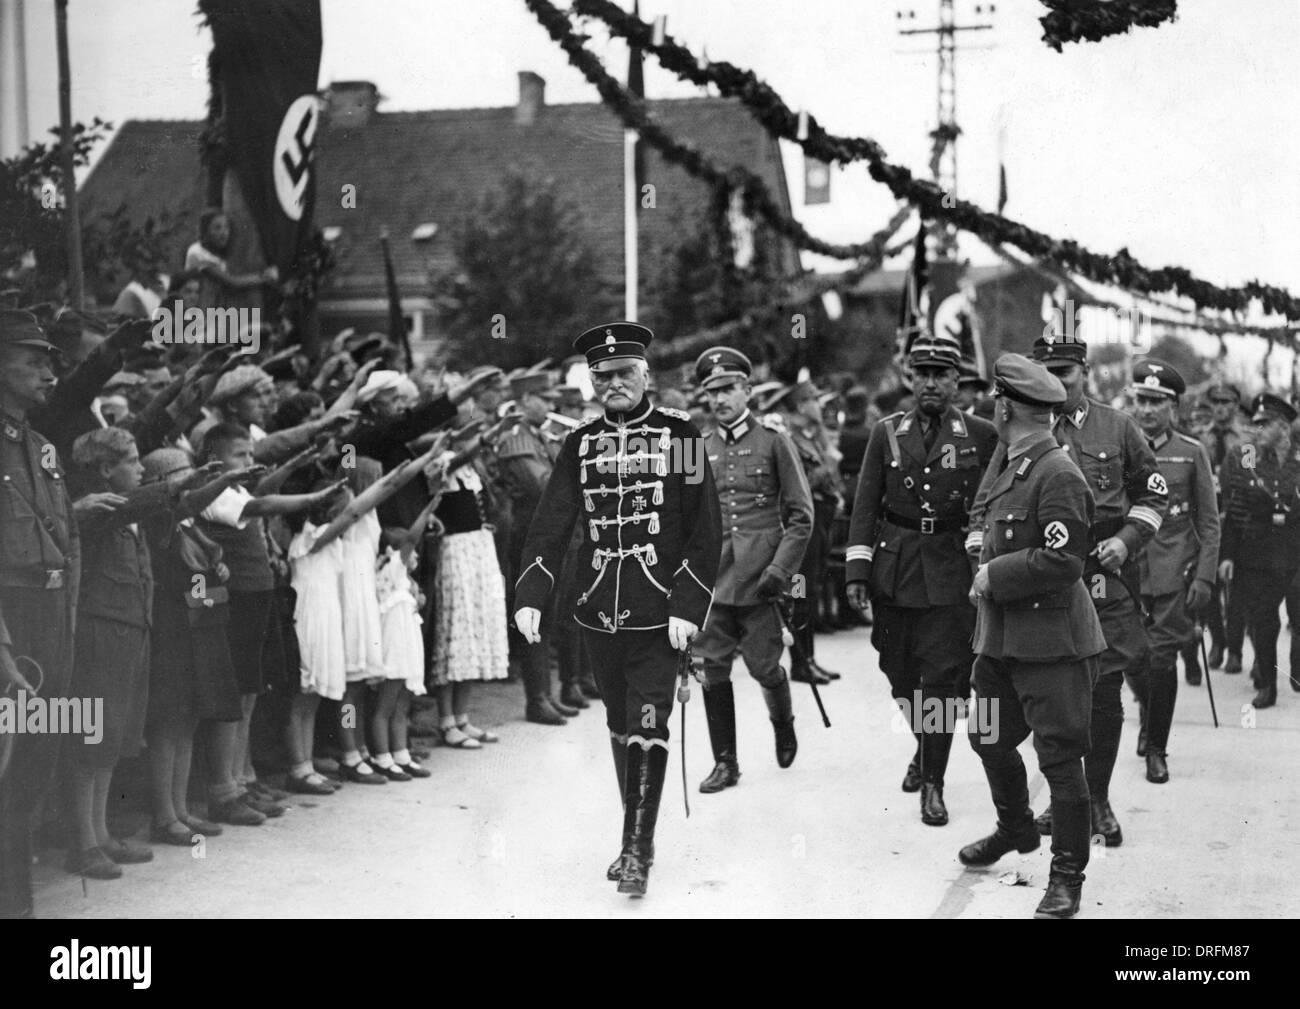 1940 Field Marshal Ceremony